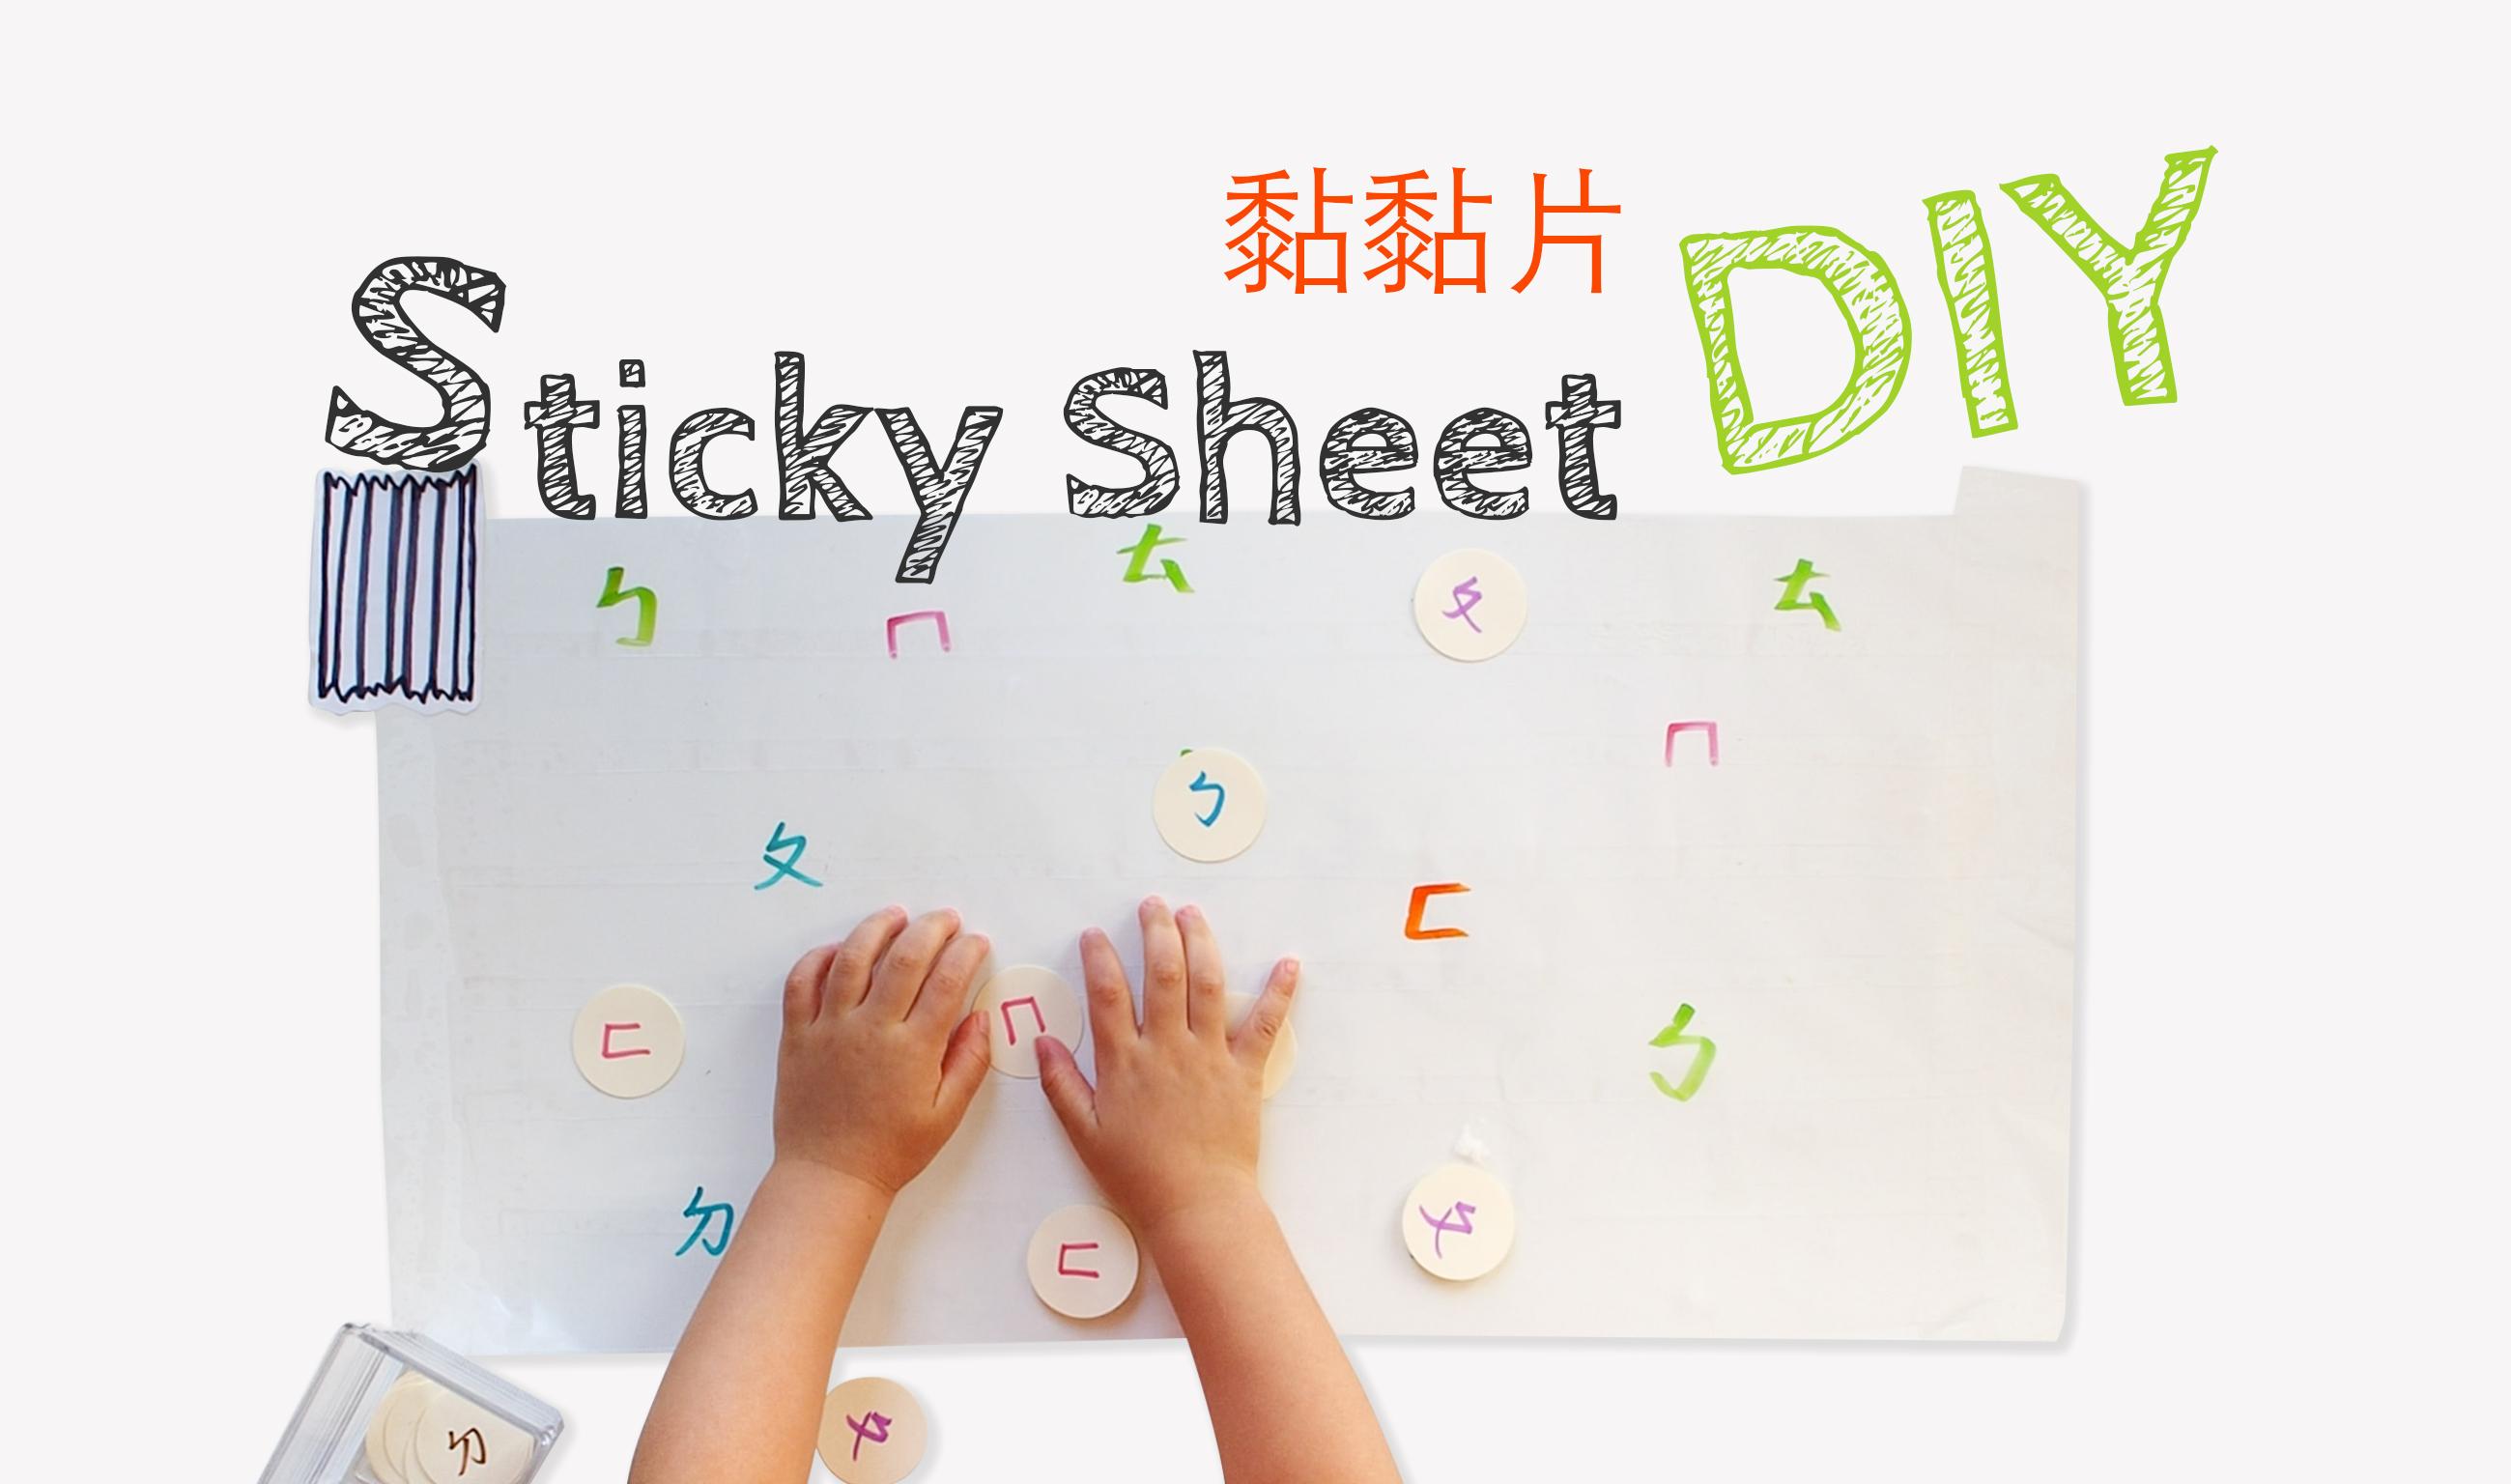 DIY 黏黏片 - 透明膠帶的多種玩法 DIY Sticky Sheet